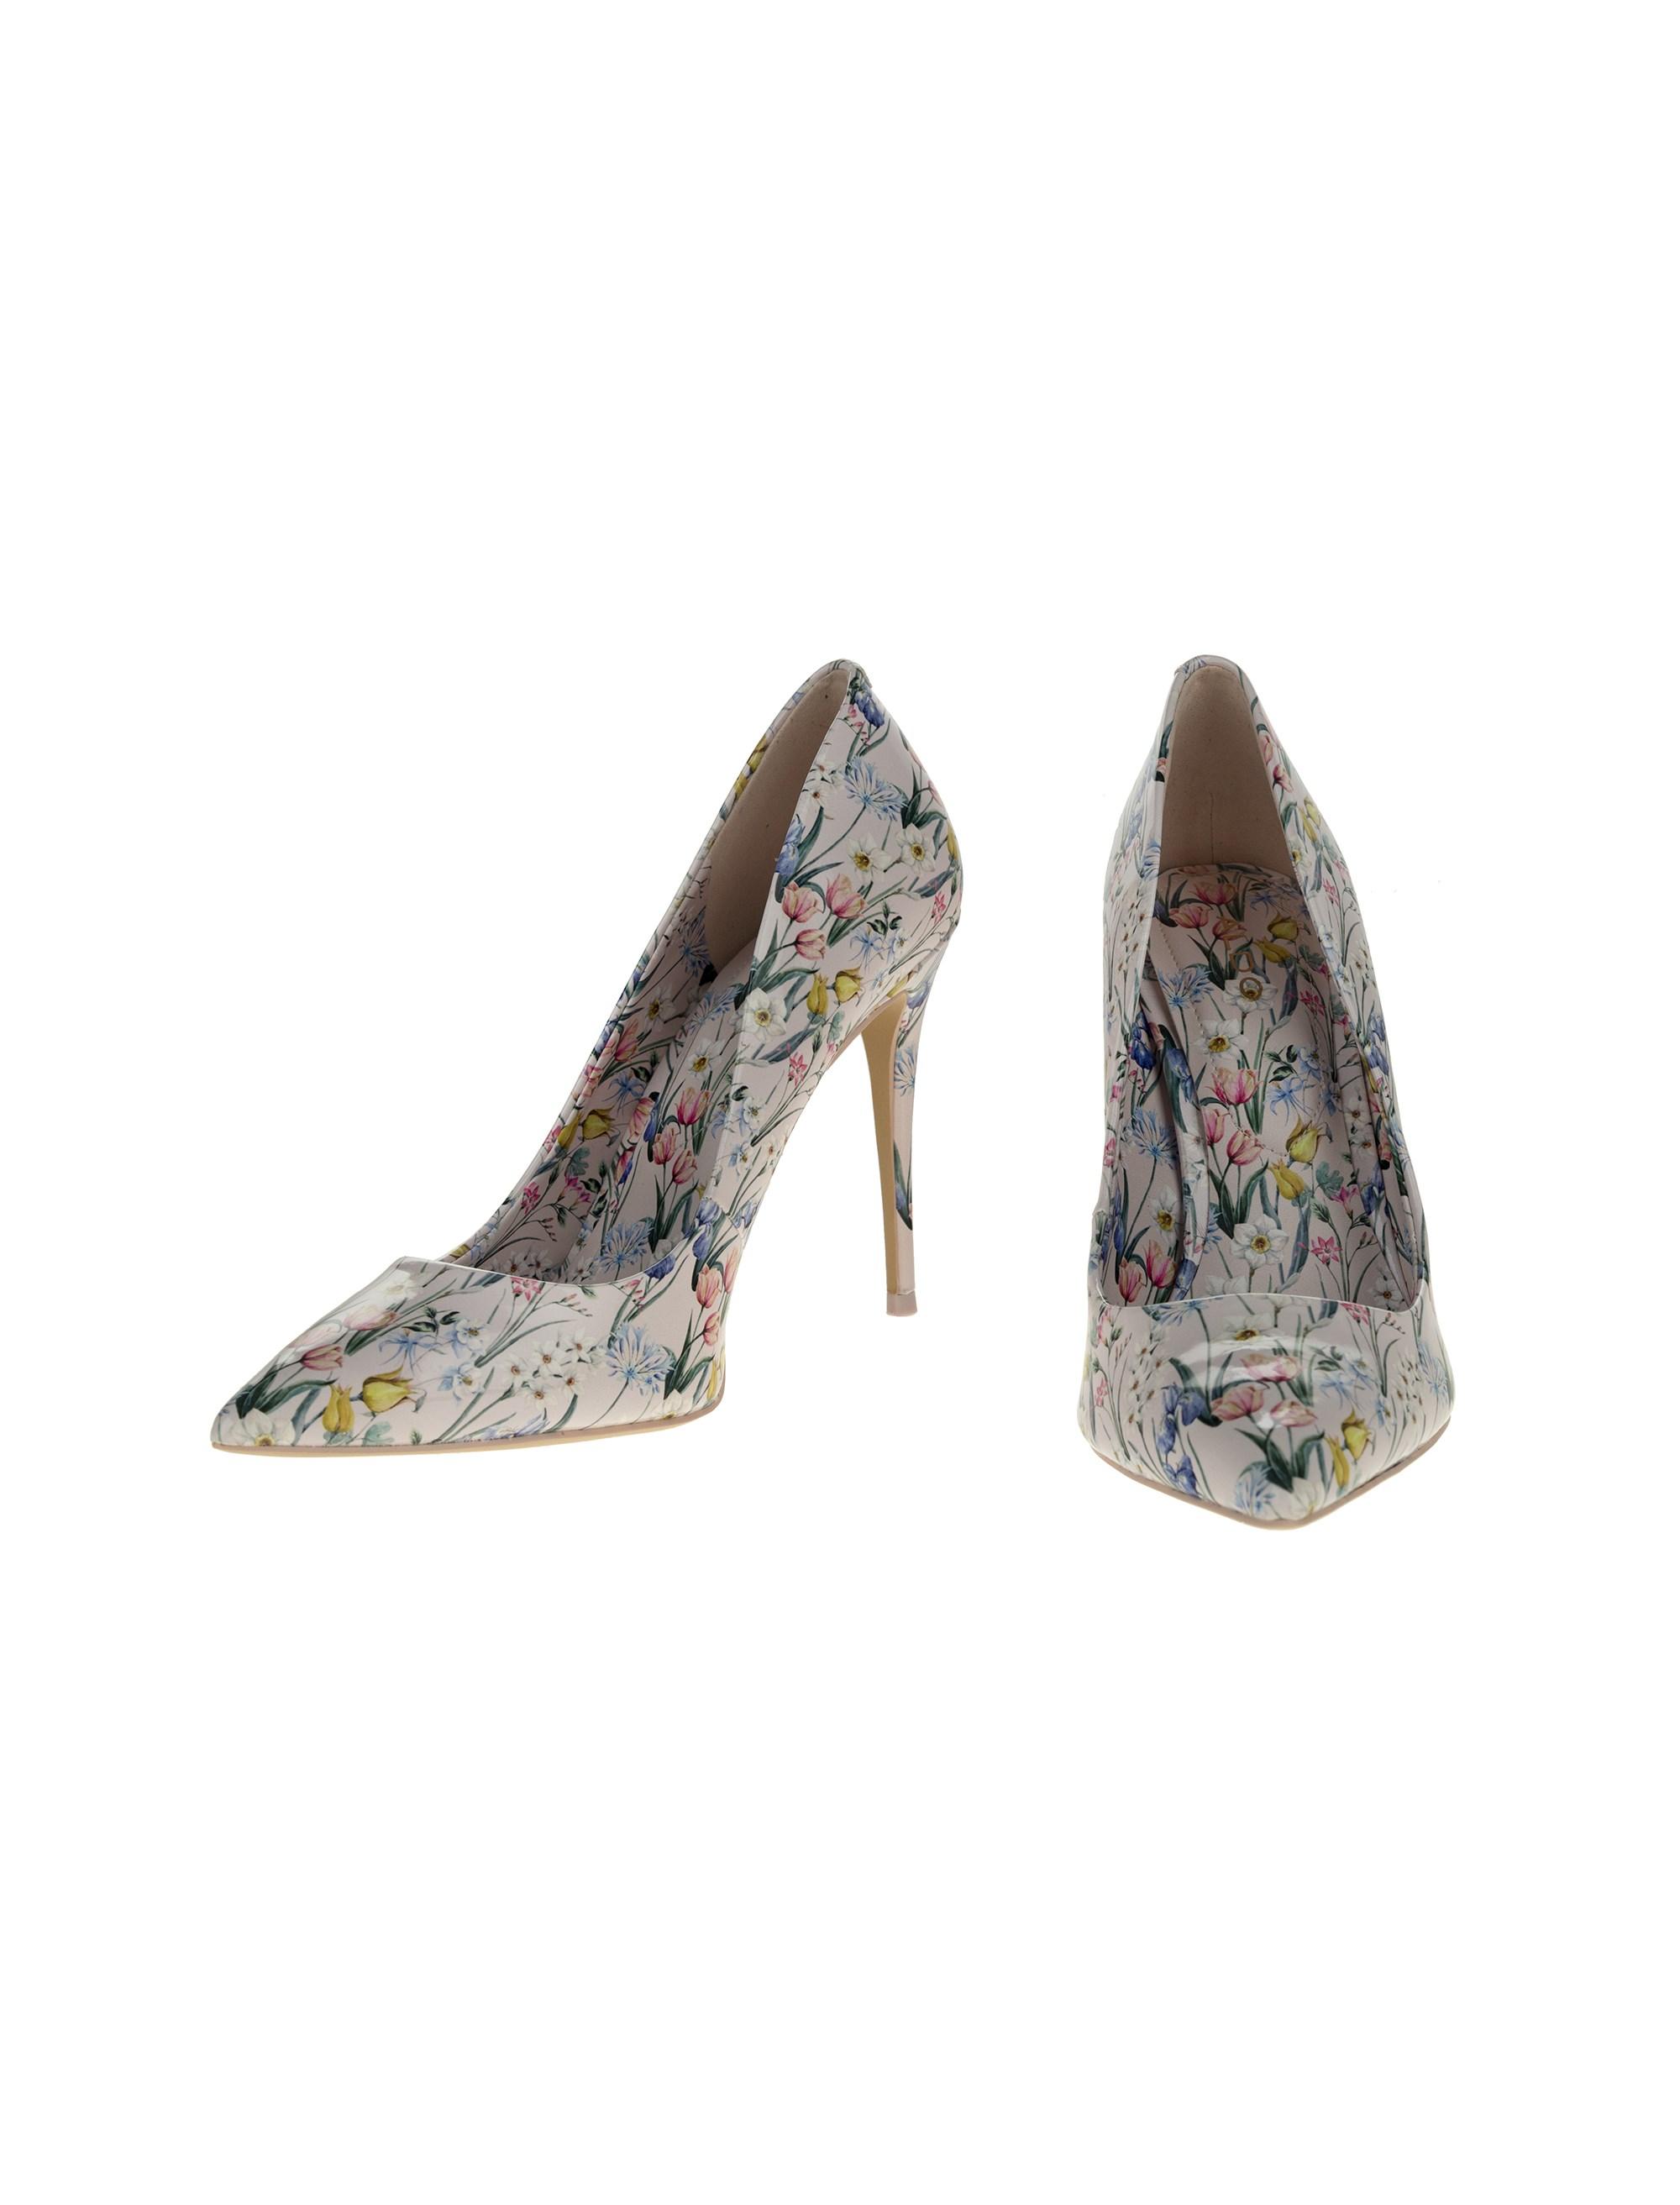 کفش پاشنه بلند زنانه - آلدو - صورتي  - 4